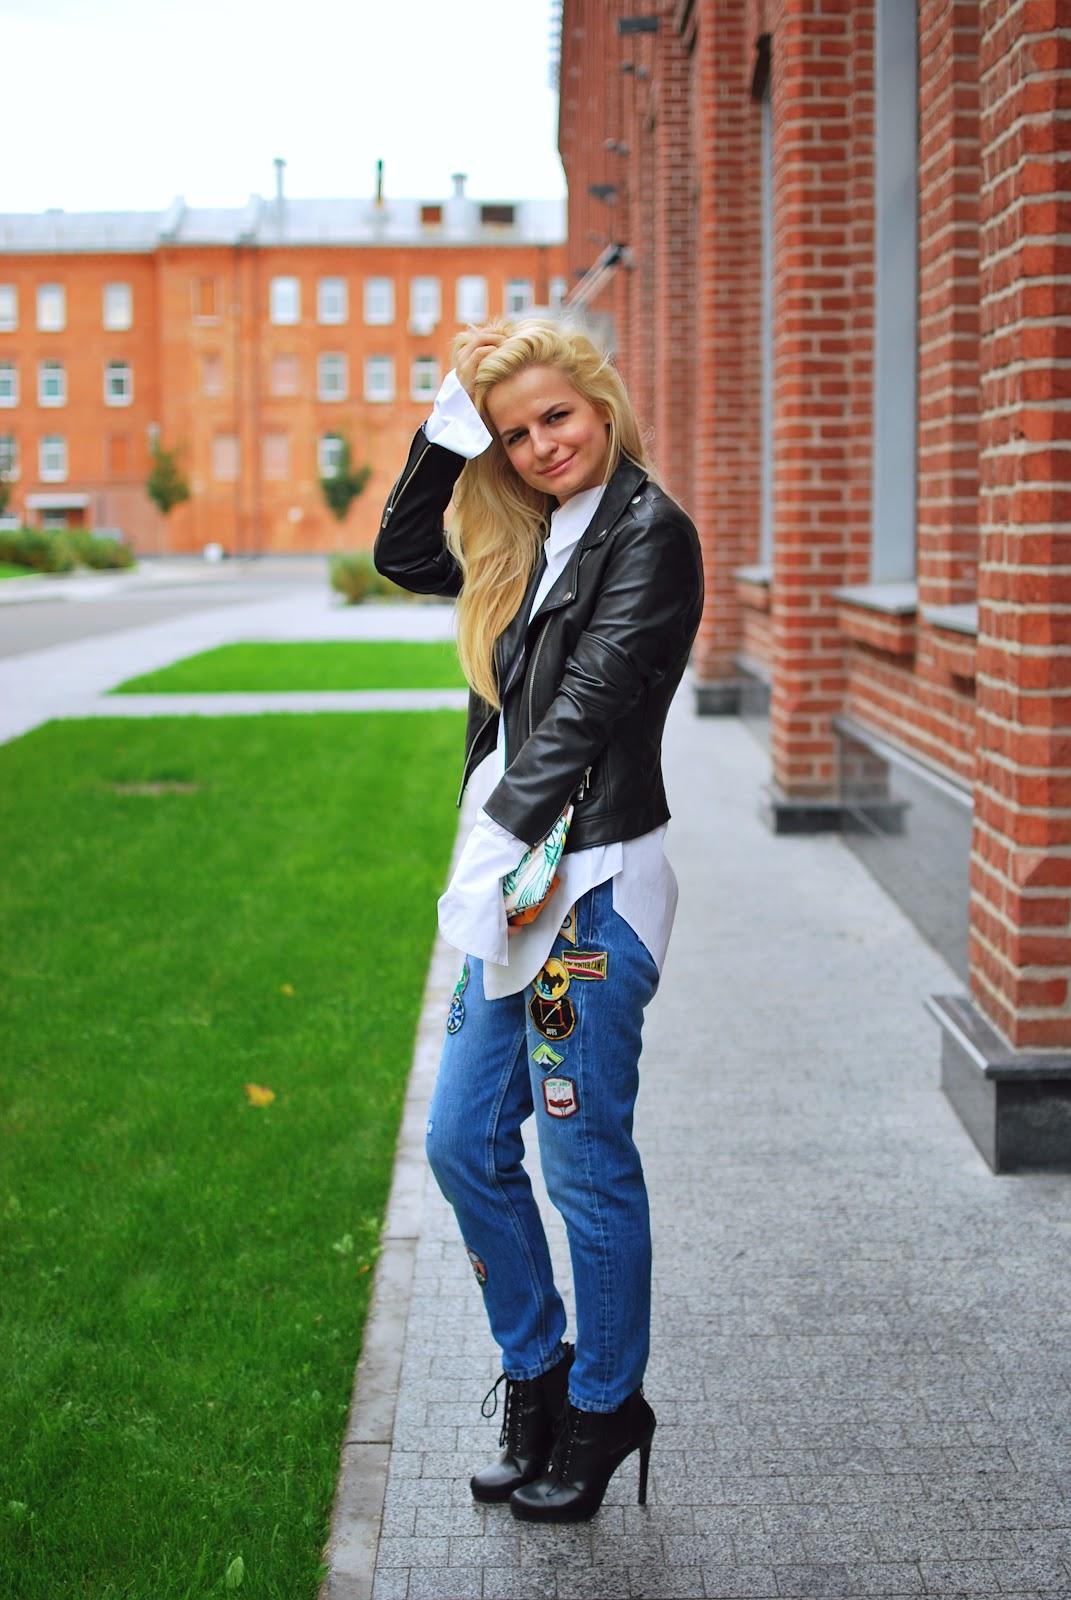 мода 2016, уличная мода, фэшн блоггер, модный блоггер, модные луки, модный лук,blogger fashion look, costa de la moda, street style denim, jeans with patches, what to wear